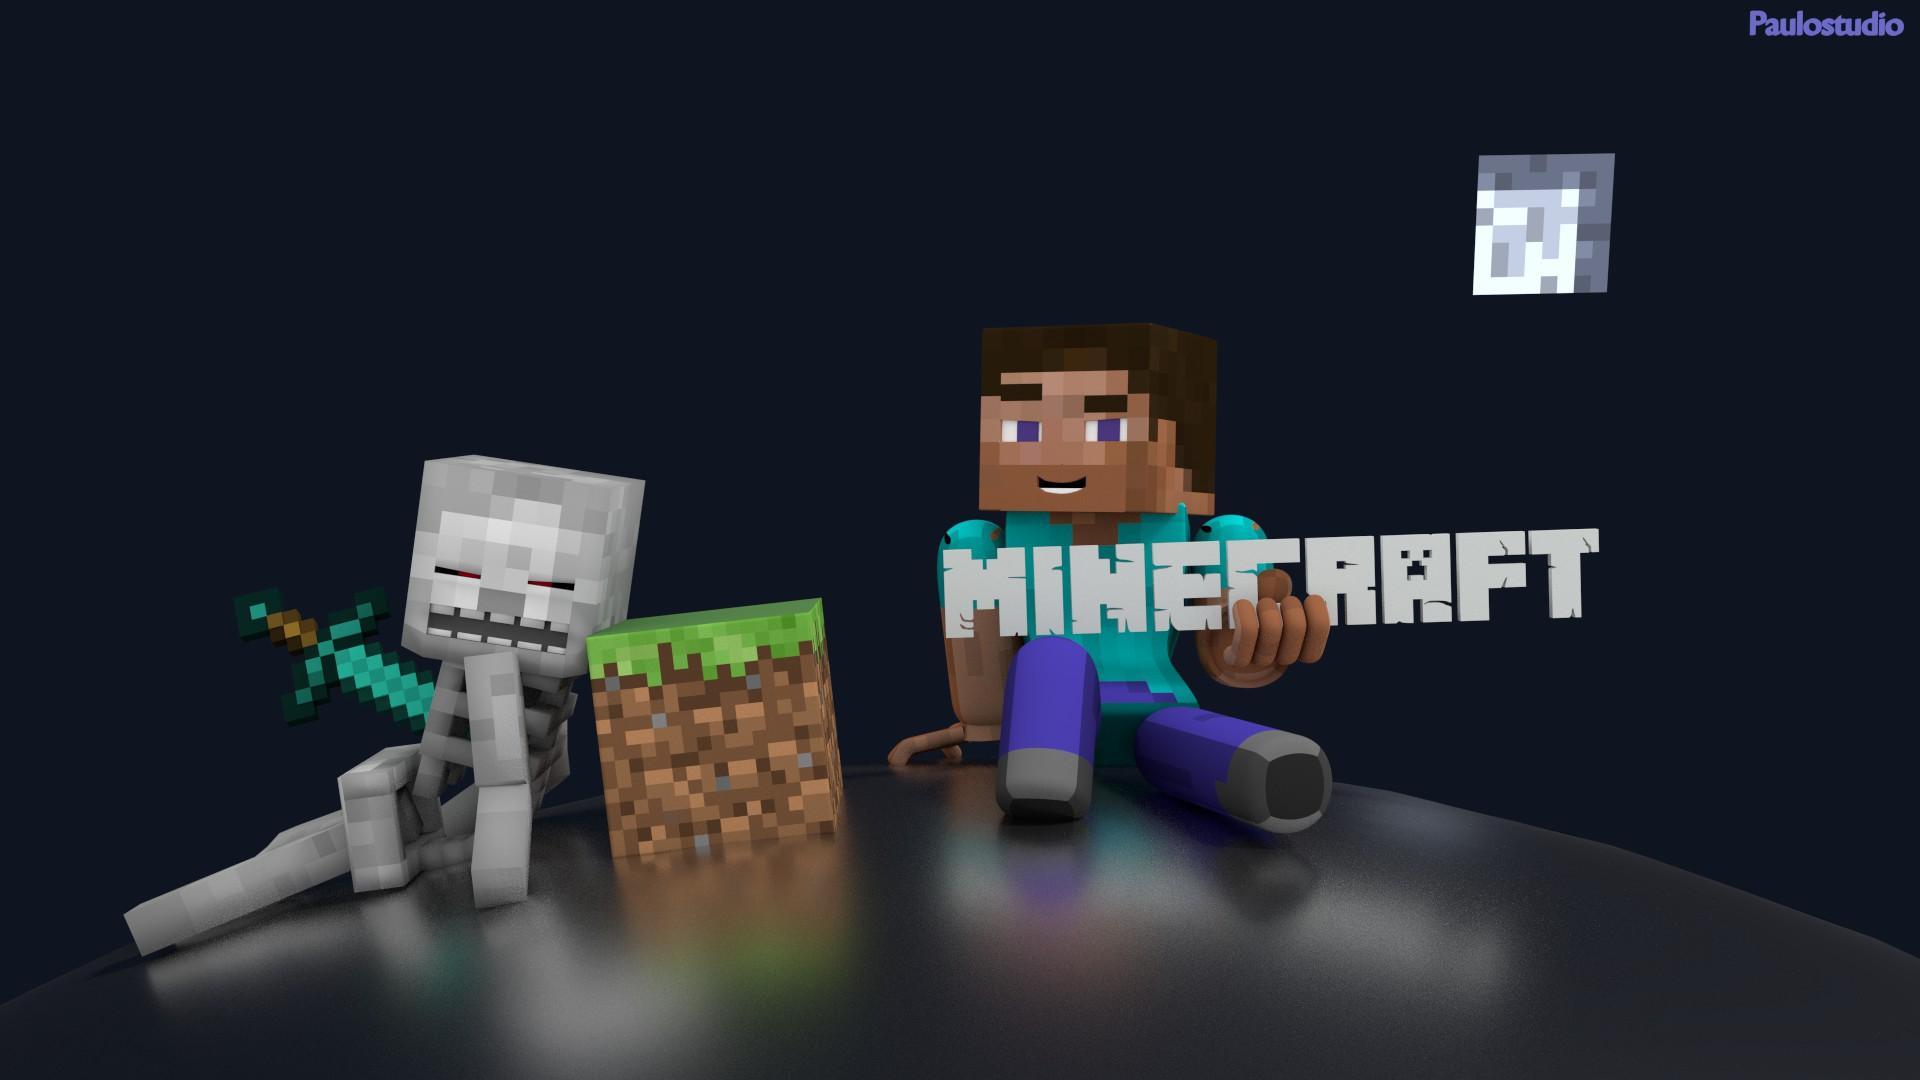 hinh nen minecraft 21